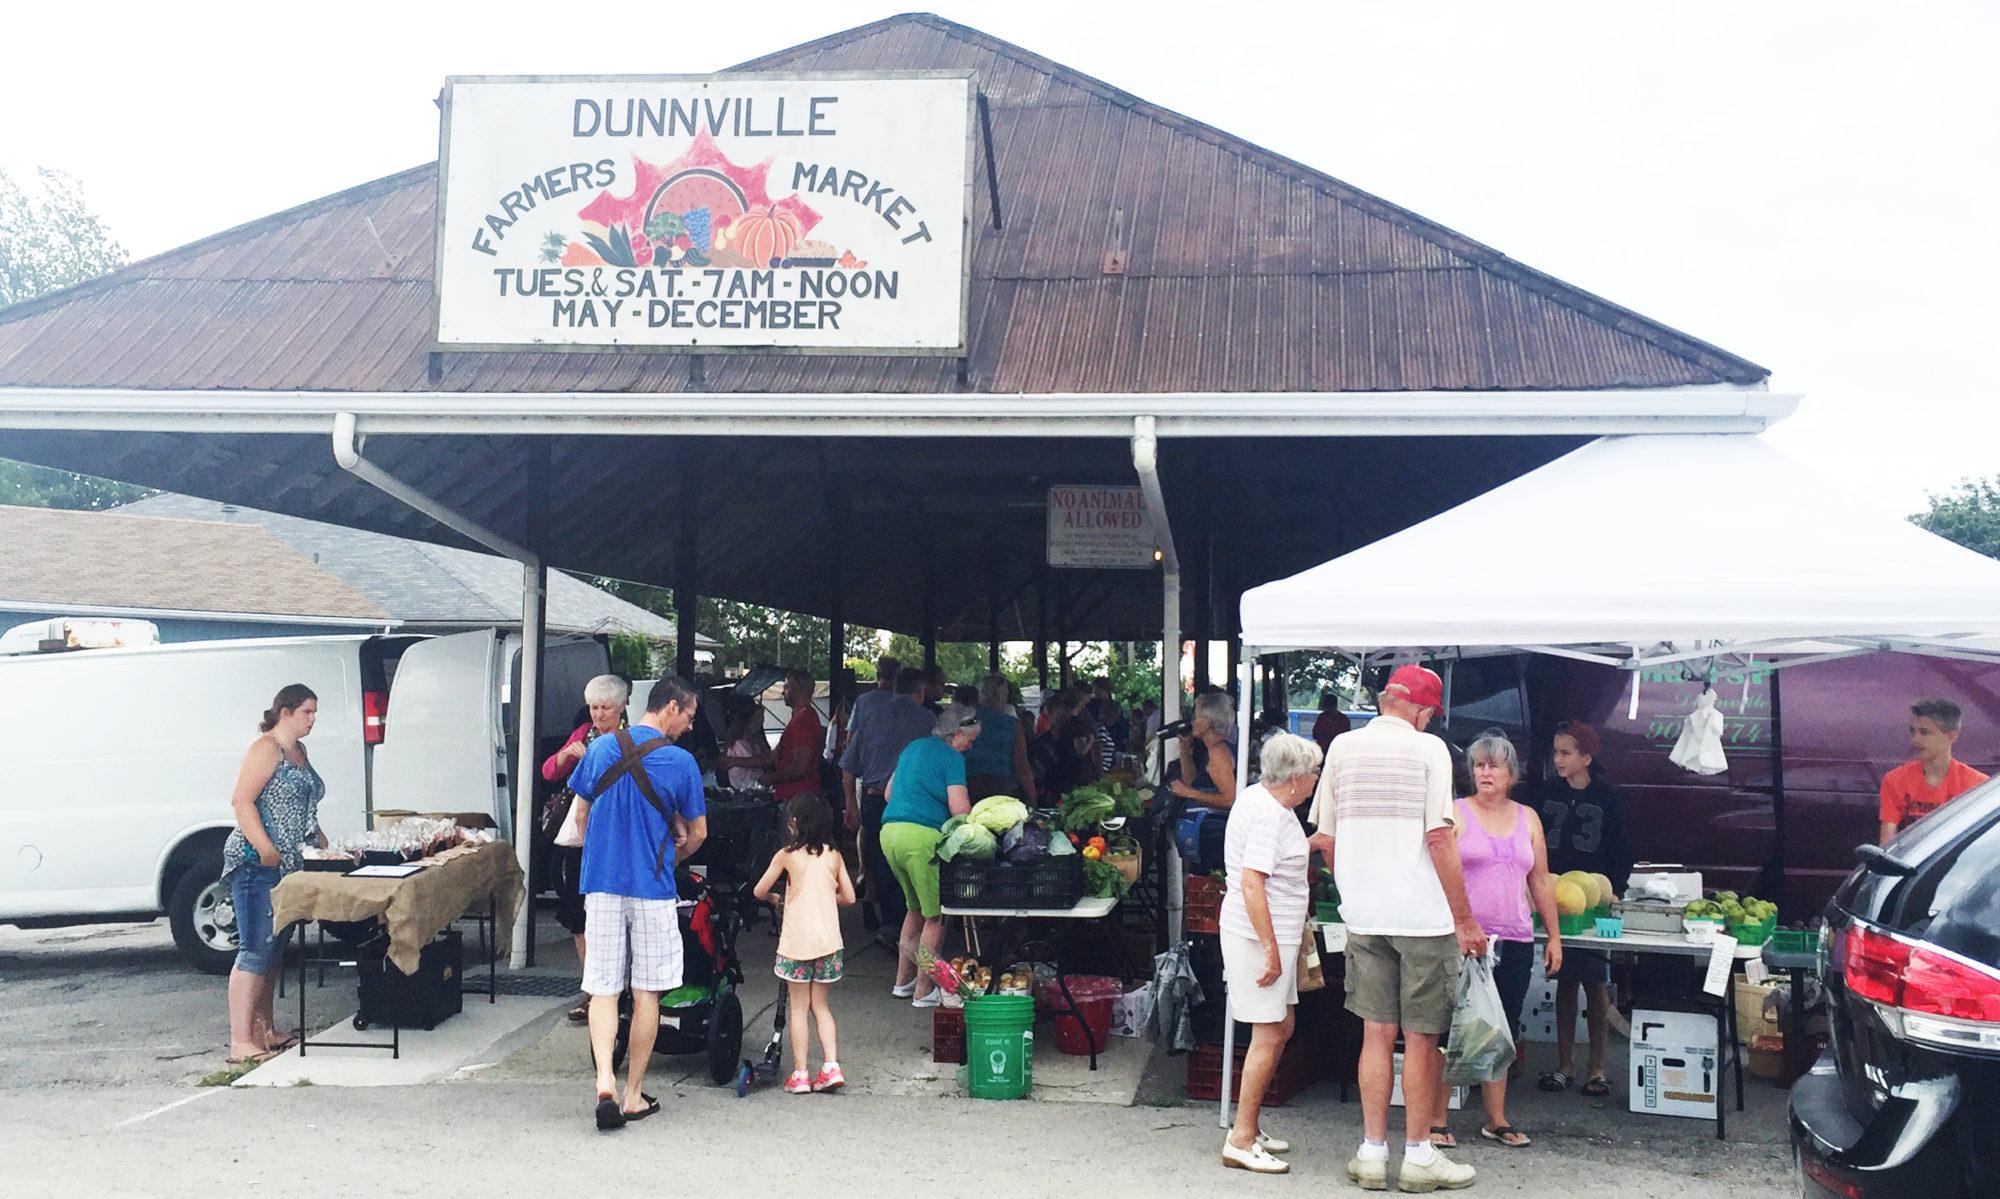 Dunnville Farmers' Market